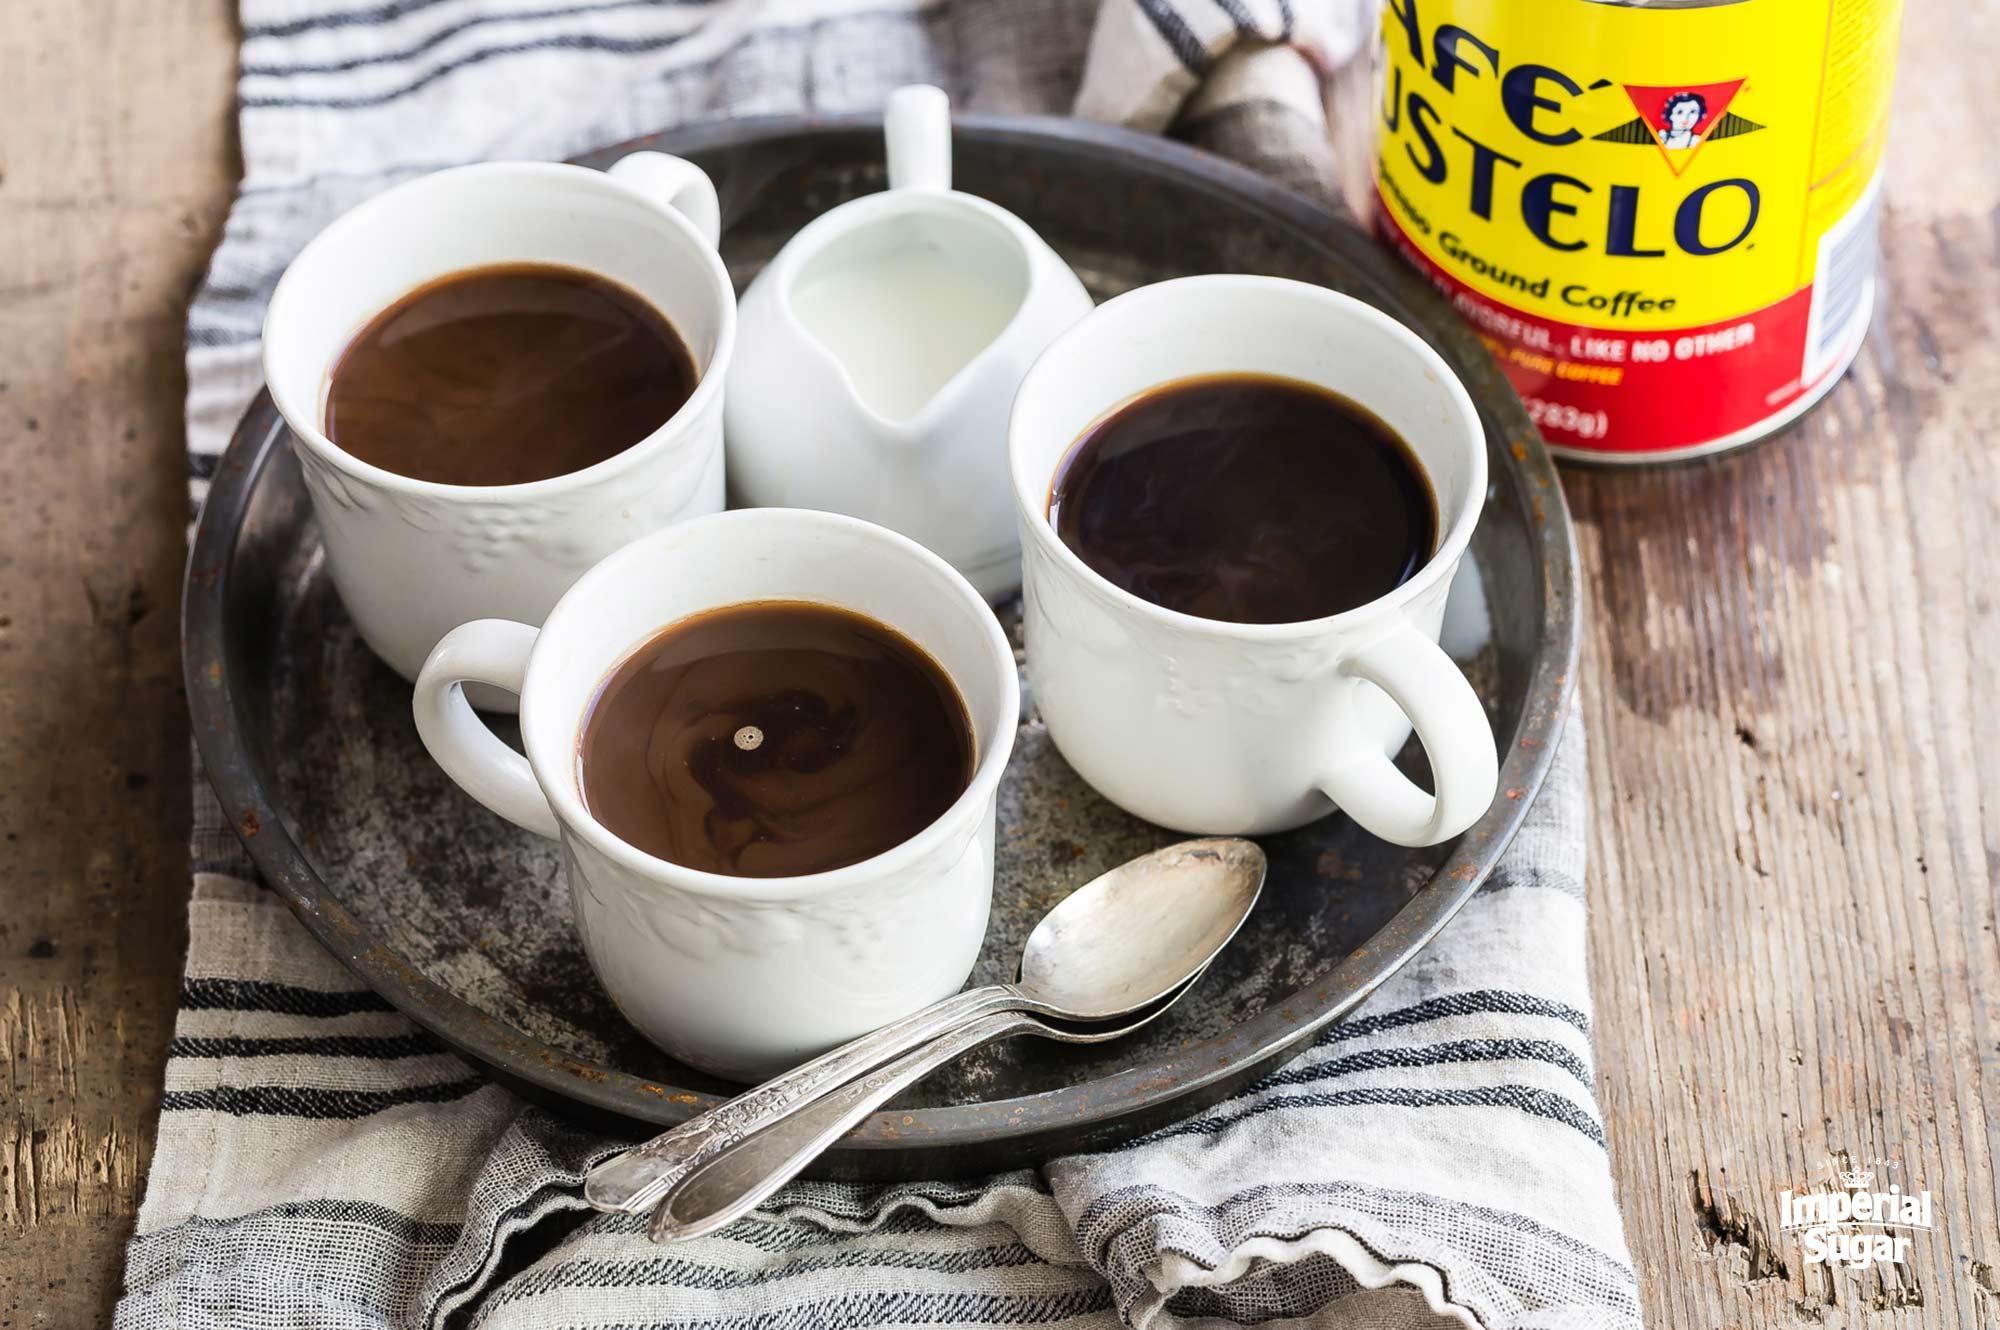 cuban coffee recipe - how to make cafe cubano | MokaBees